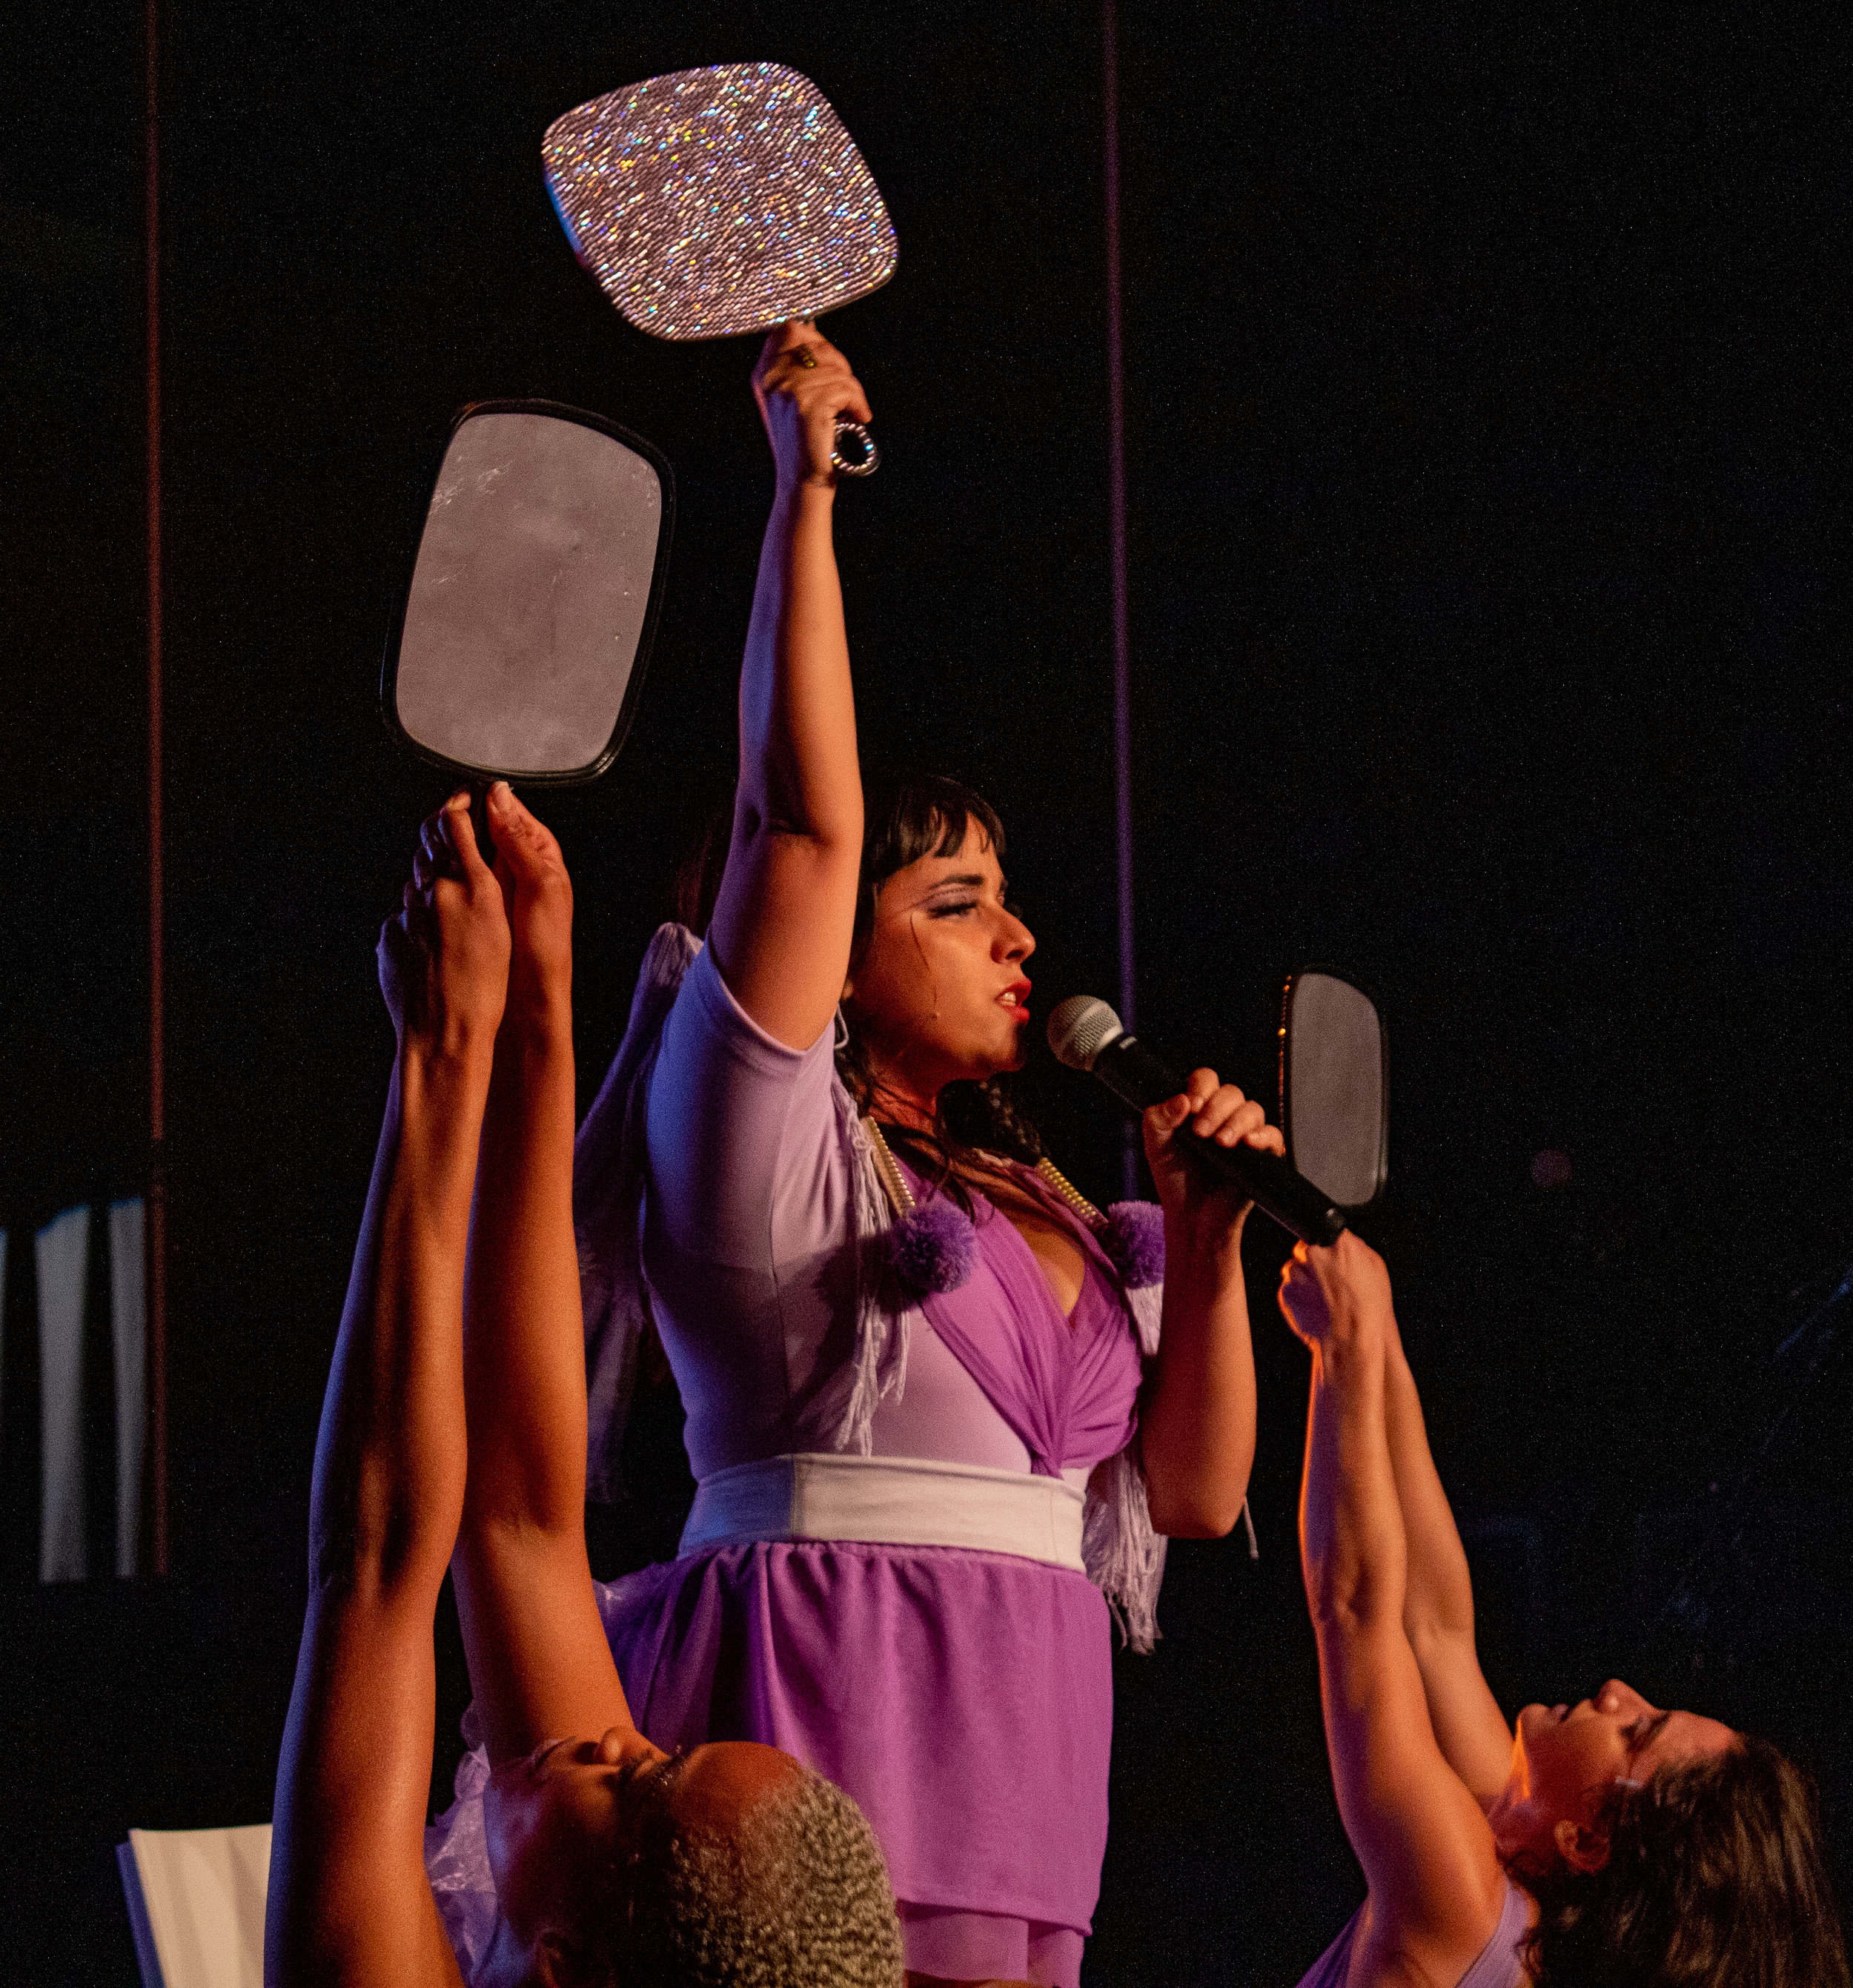 Jarina De Marco performing at We Rise LA on May 17, 2019 in Los Angeles, California. Danica Creahan / The Corsair